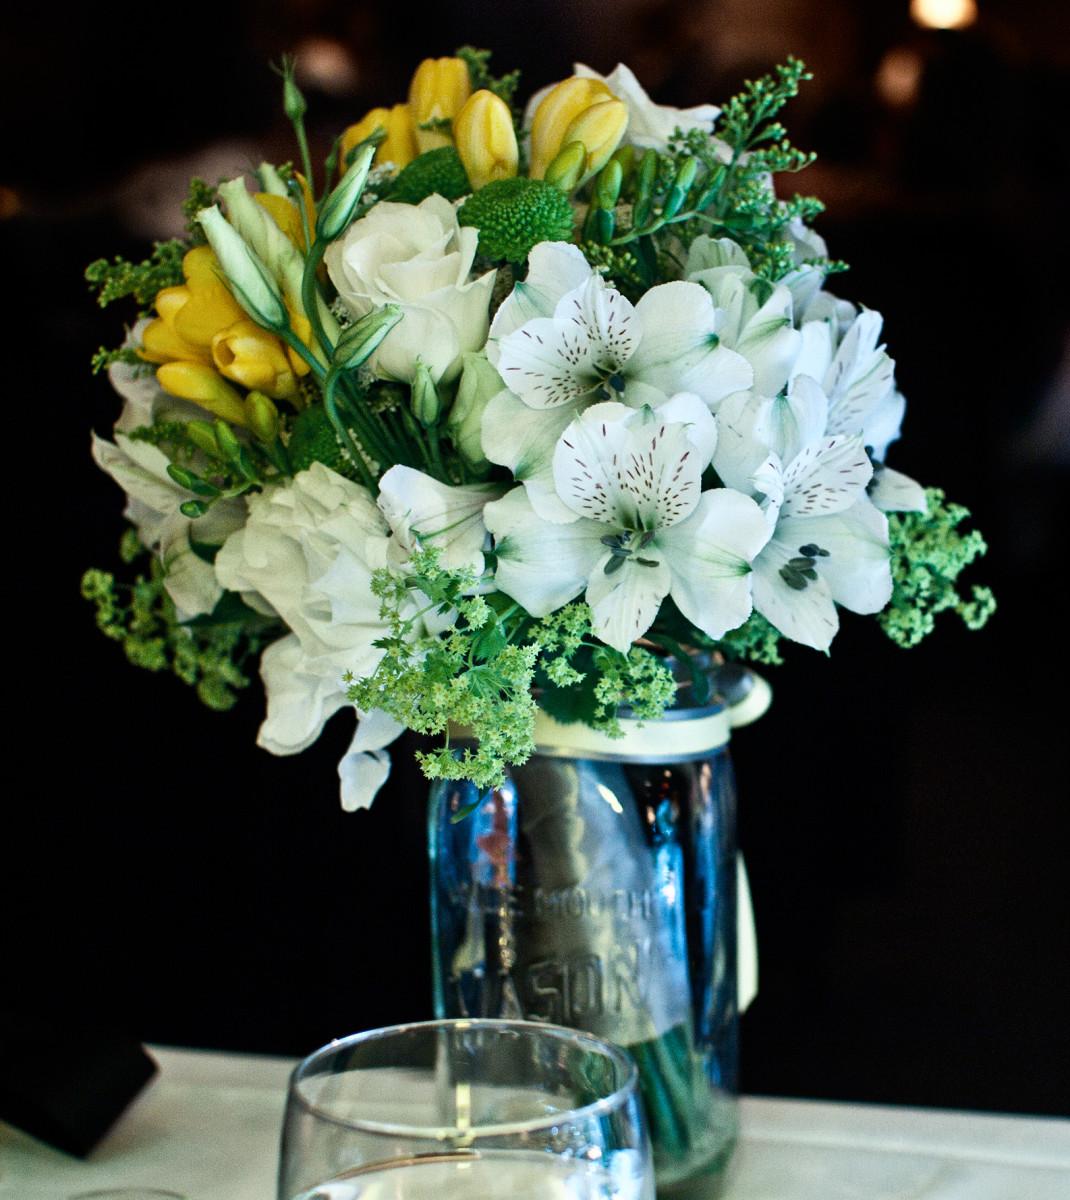 Mason jars make whimsical vases for real or fake flower bouquets.